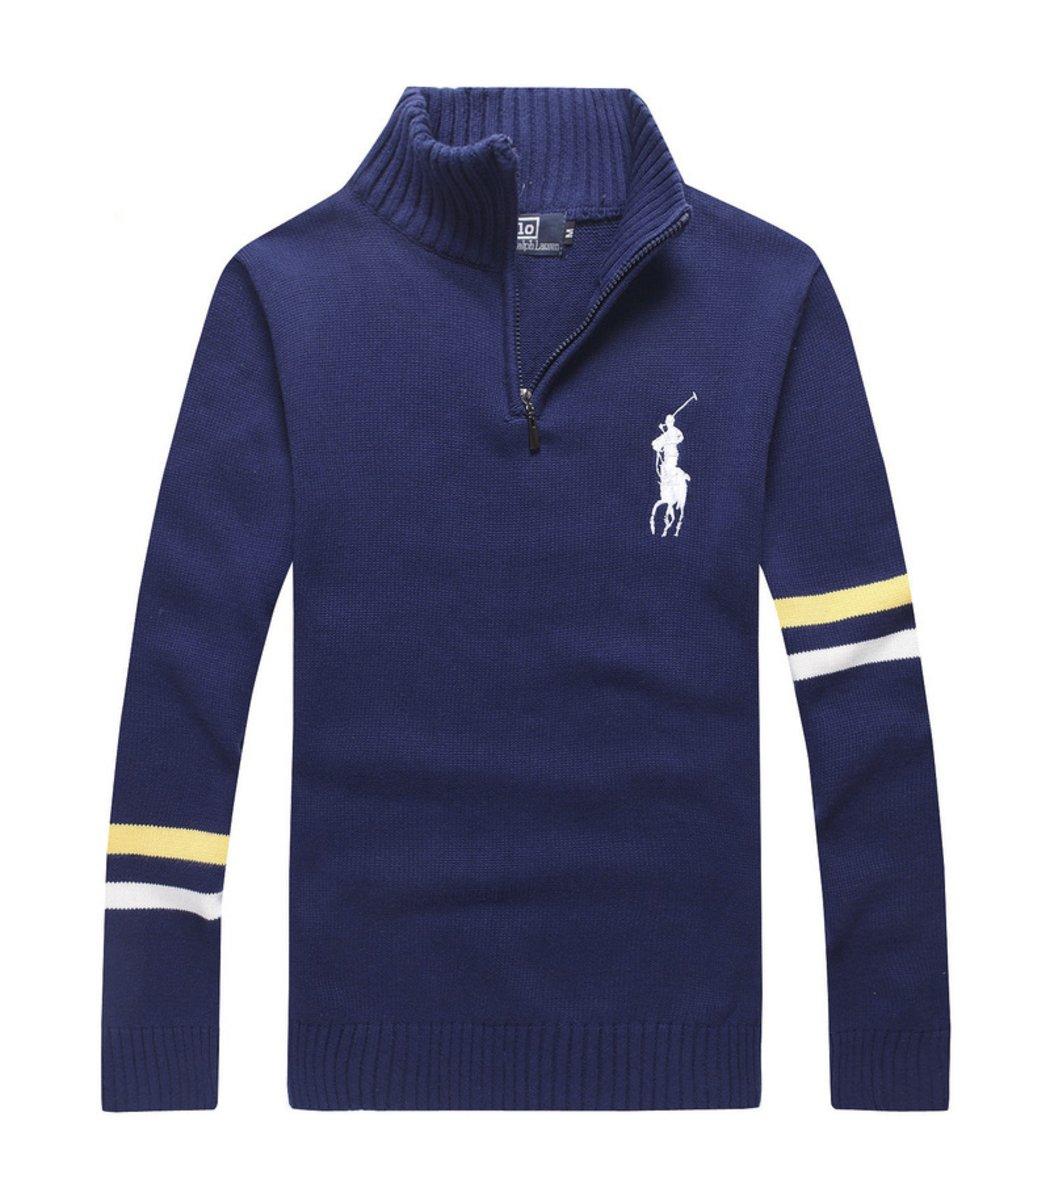 Синий свитер POLO Ralph Lauren воротник стойка на молнии SR1